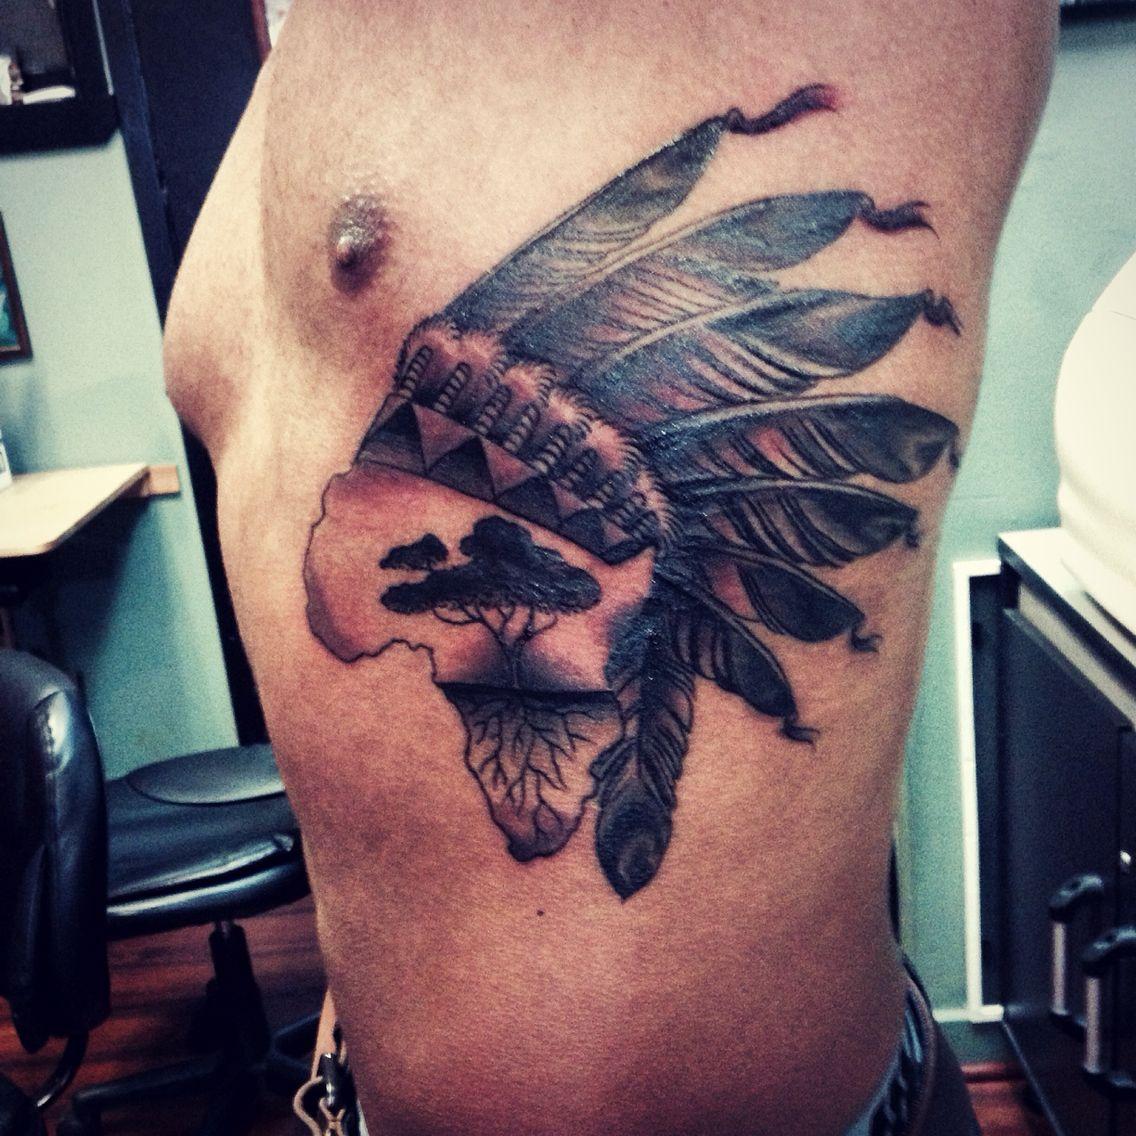 African Native American Tattoo Blackfoottribe Africanamerican Native American Tattoo American Tattoos African Tattoo